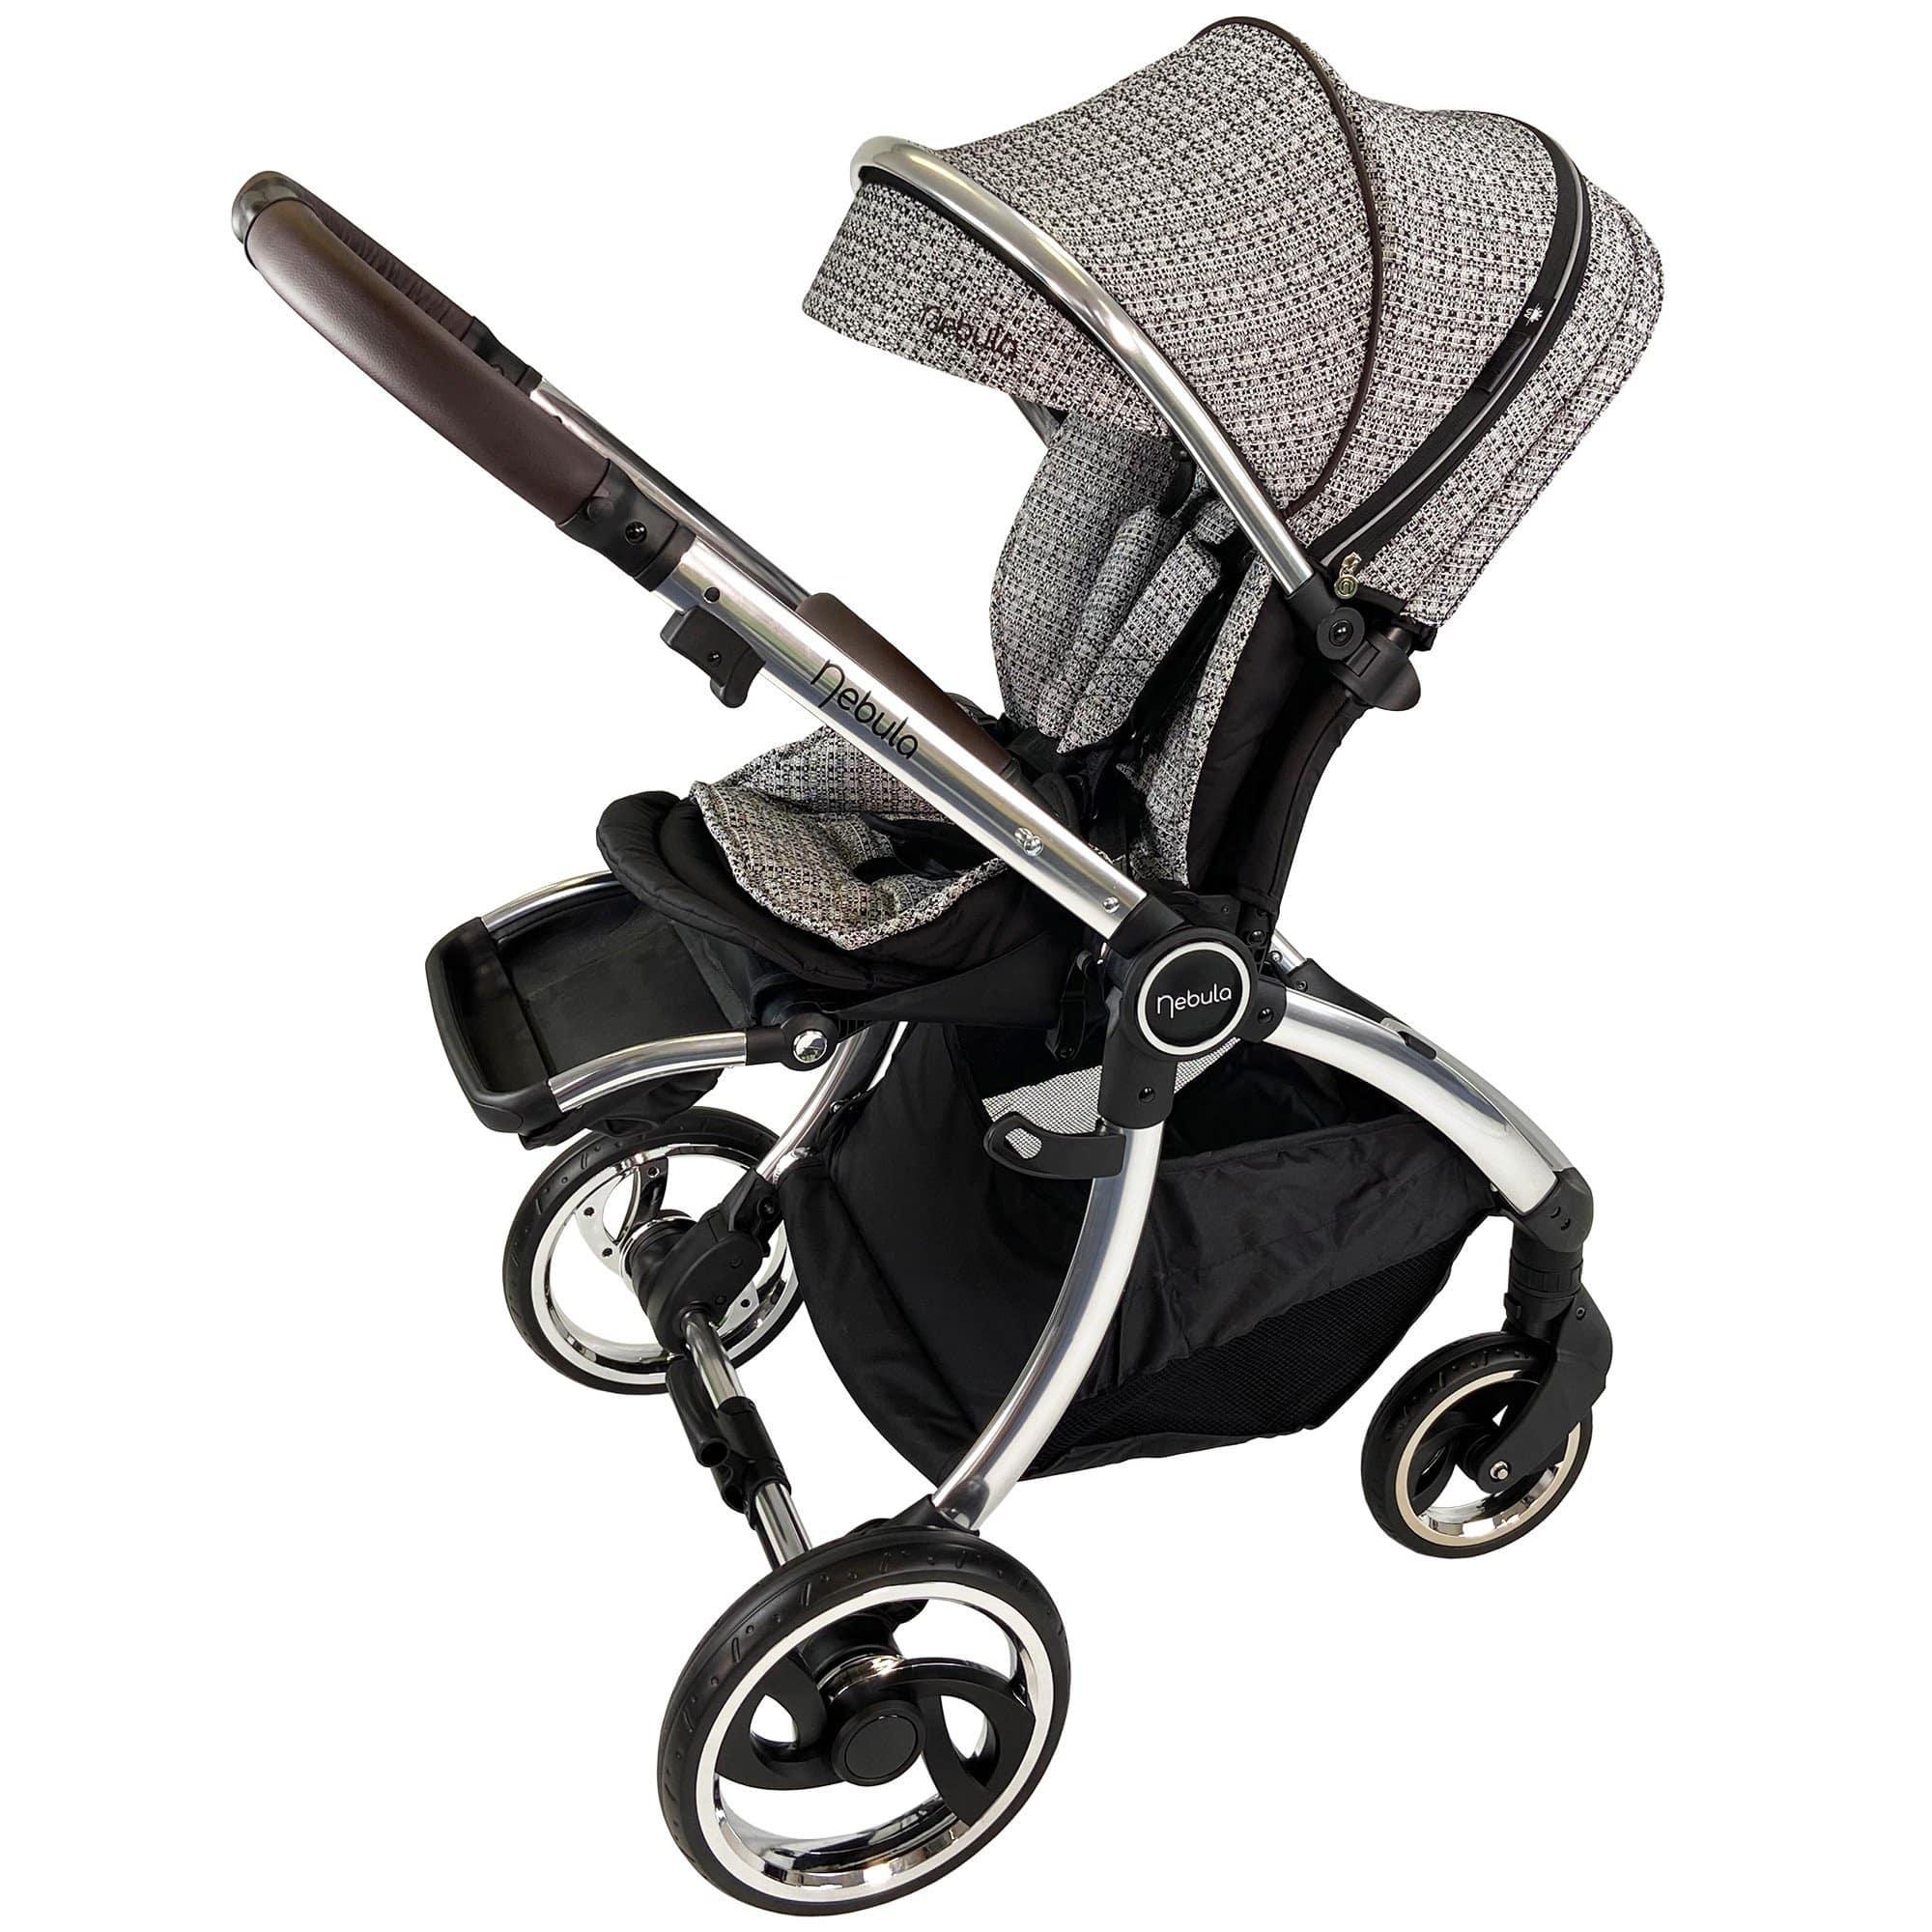 Venture Nebula Signature Edition stroller in parent facing mode.